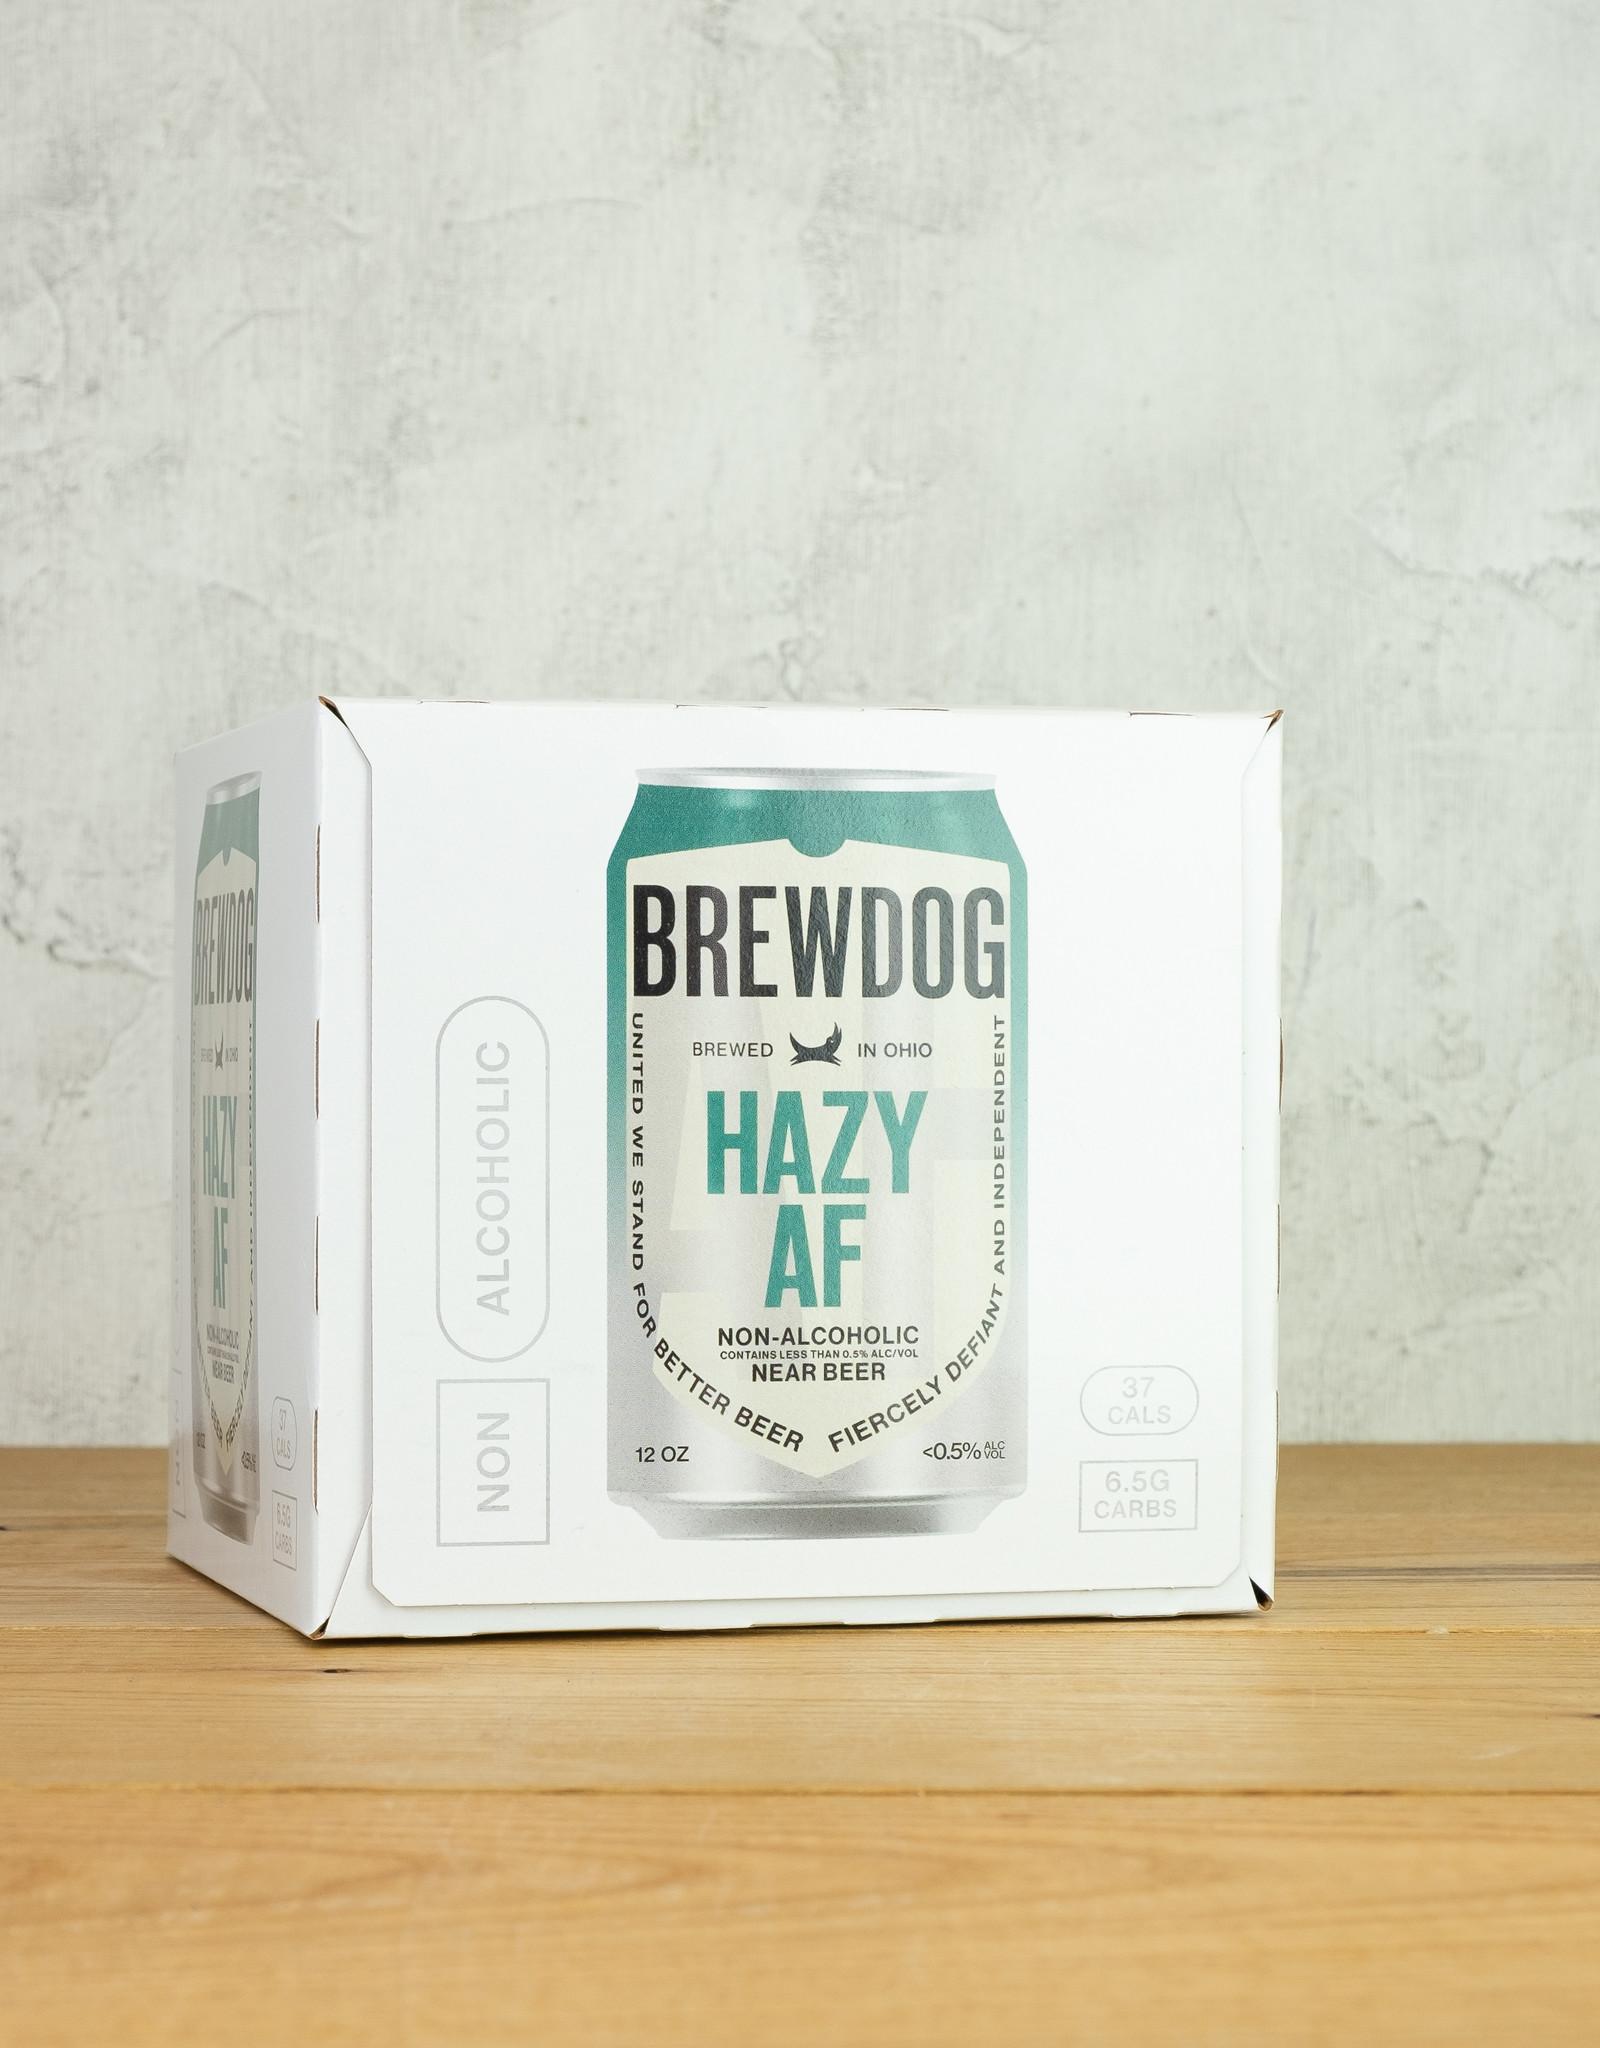 Brewdog Hazy AF Non-Alcoholic 4pk